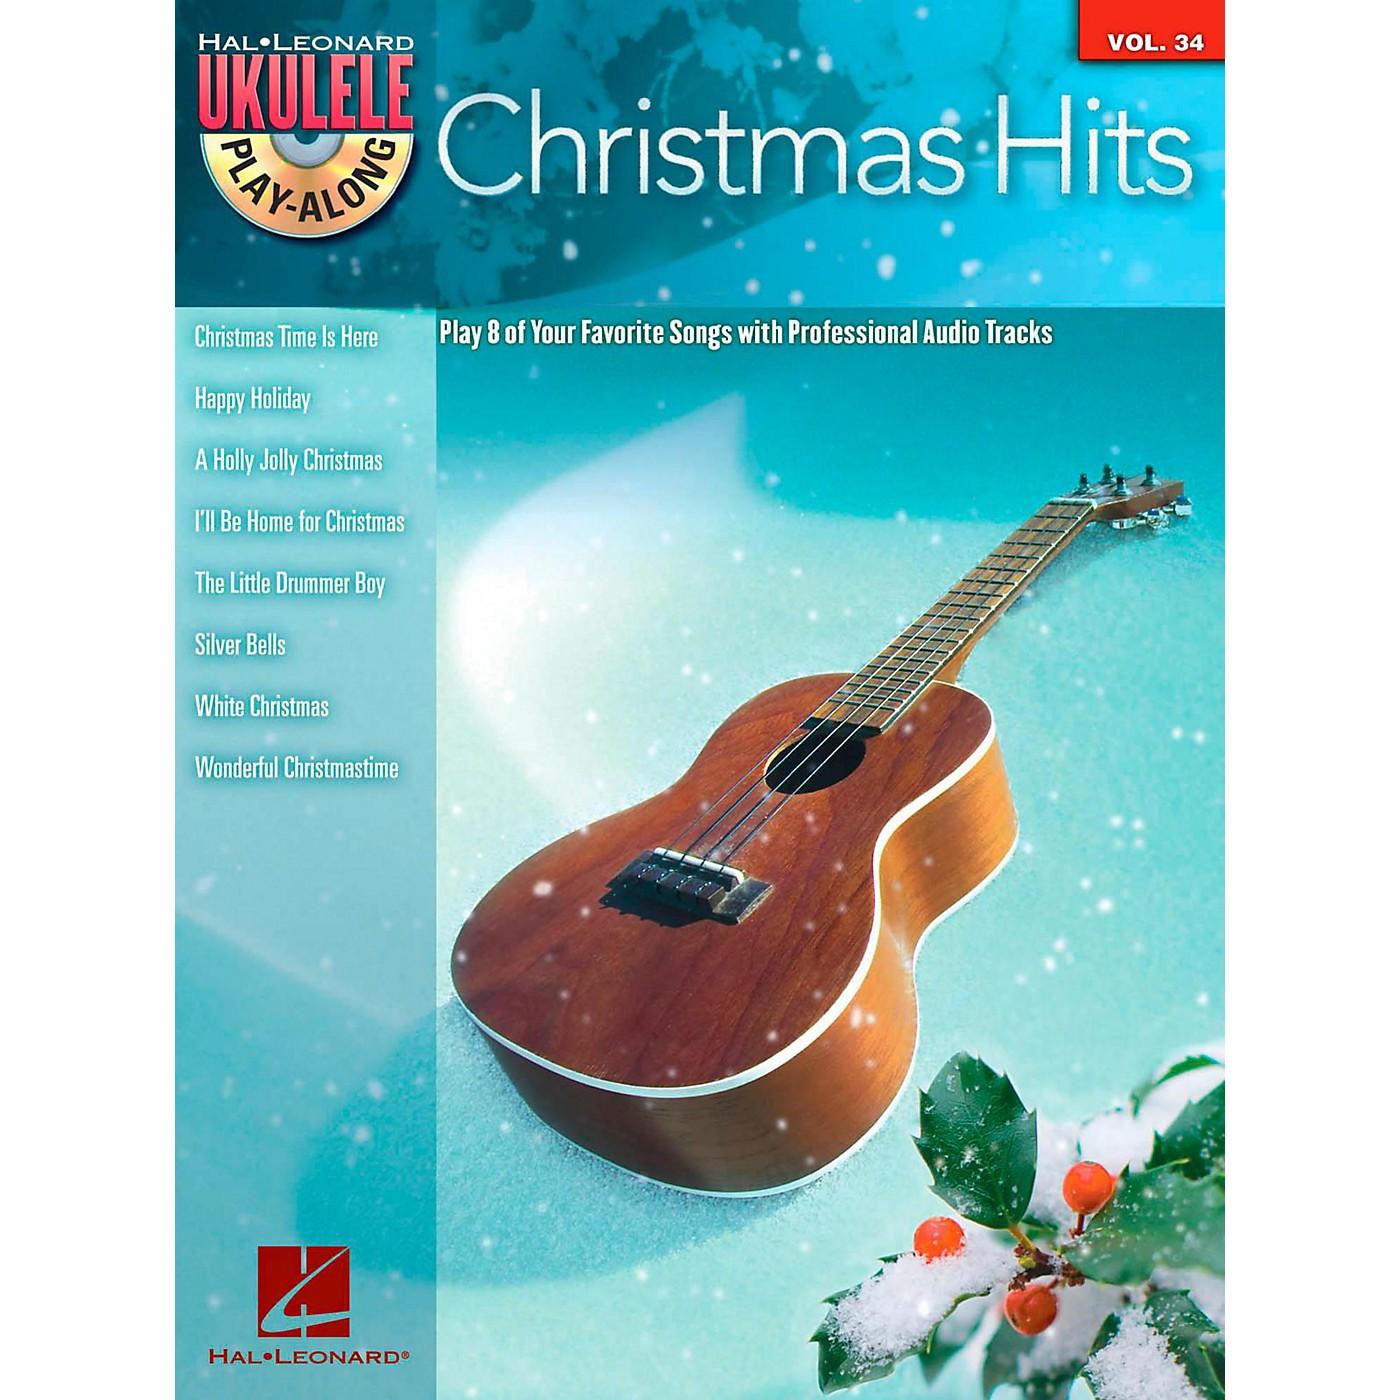 Hal Leonard Christmas Hits - Ukulele Play-Along Series Vol. 34 Book/CD thumbnail